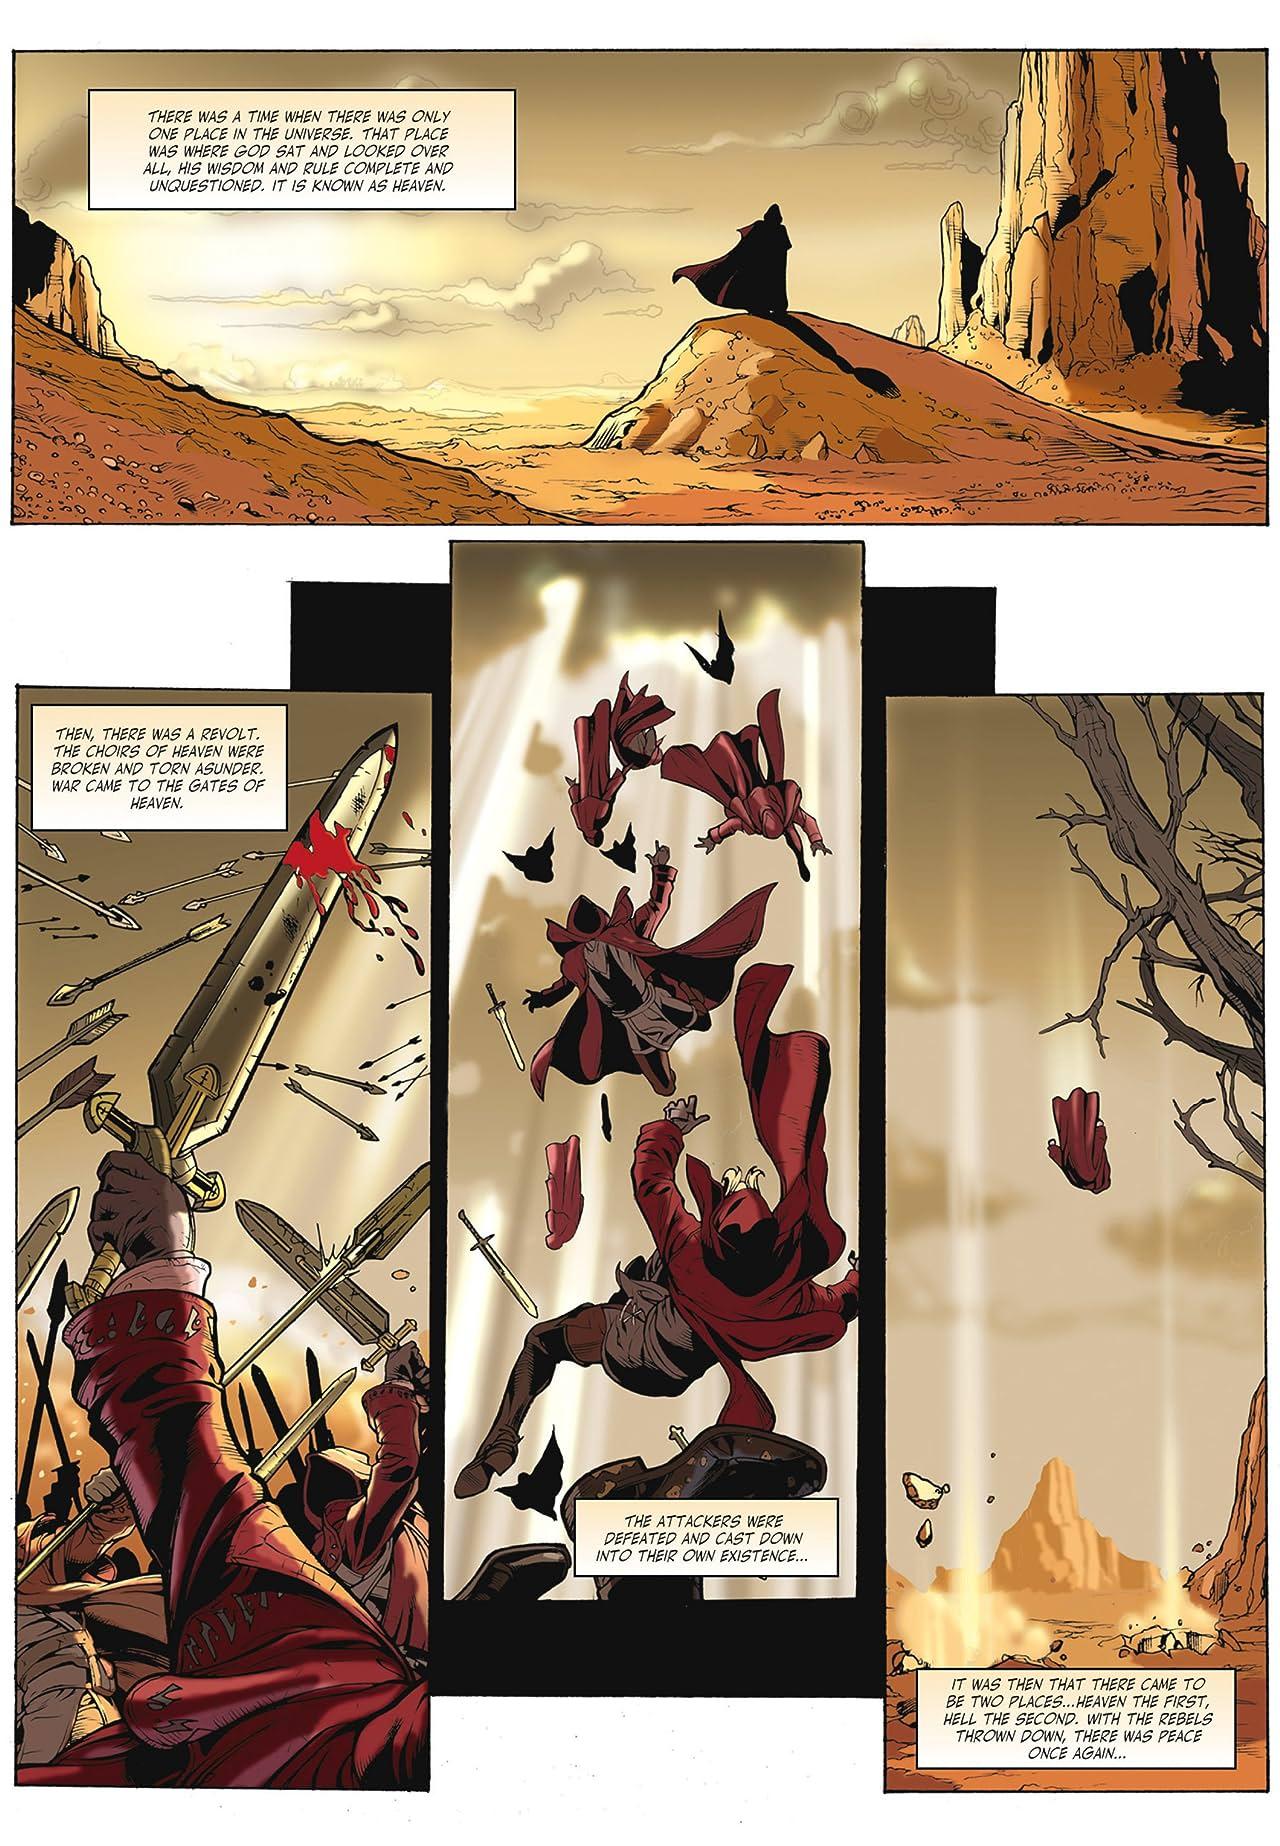 Dominion Vol. 2: The Sandman